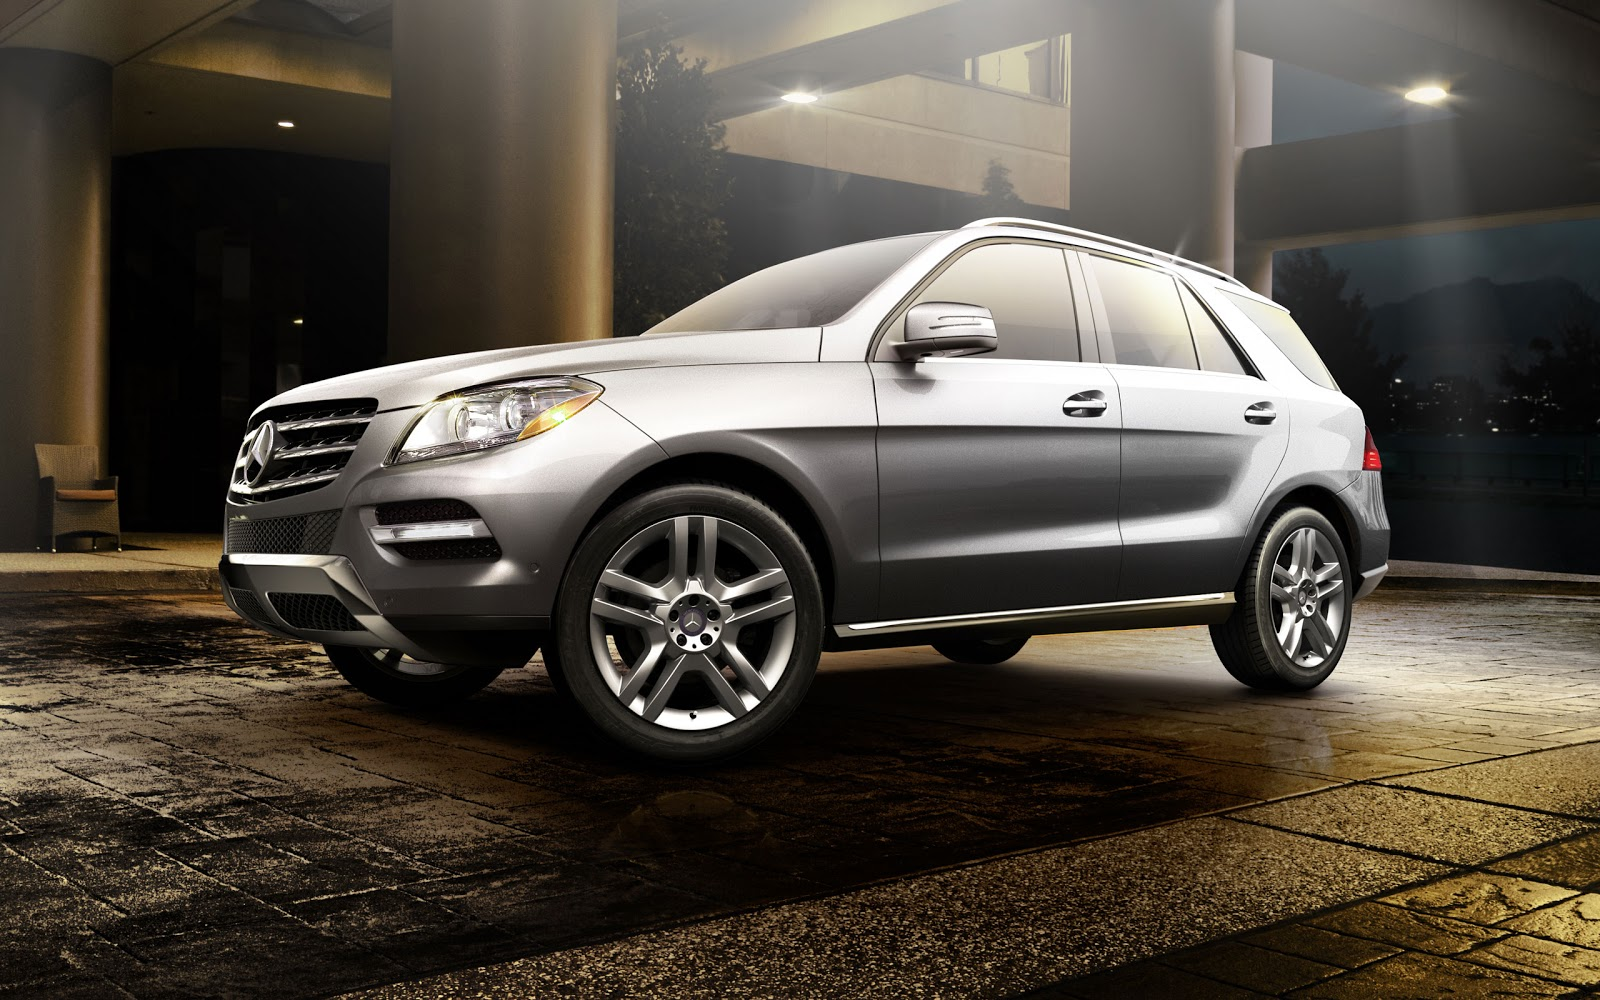 http://3.bp.blogspot.com/-MG1U6fNt-5c/UJ75cygrv2I/AAAAAAAAH6M/EOU3QAWZpsw/s1600/M-Class-SUV-Mercedes+Benz-exterior-front-side-view-silver-on-road.jpg